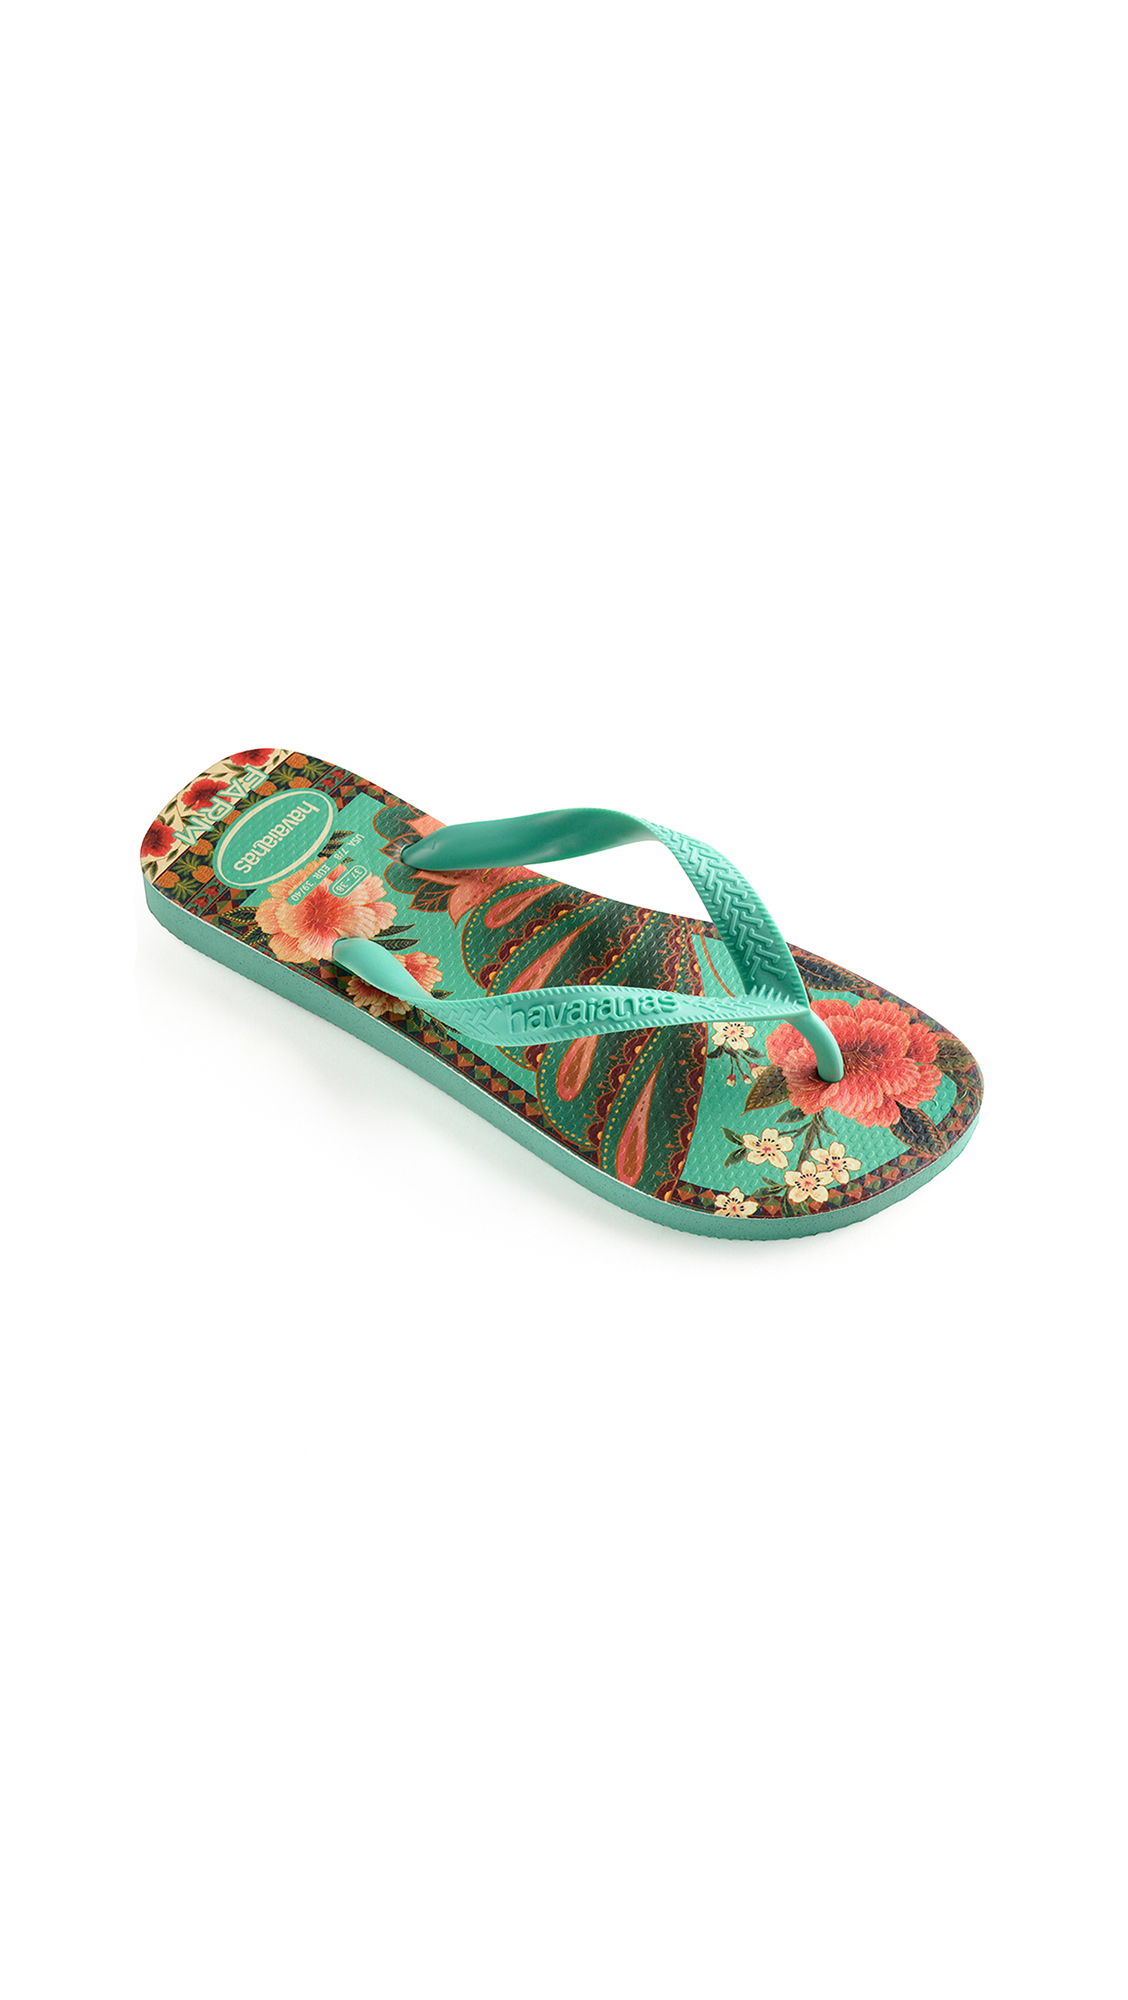 Buy Havaianas x Farm Rio Flowers Sandals online, shop Havaianas